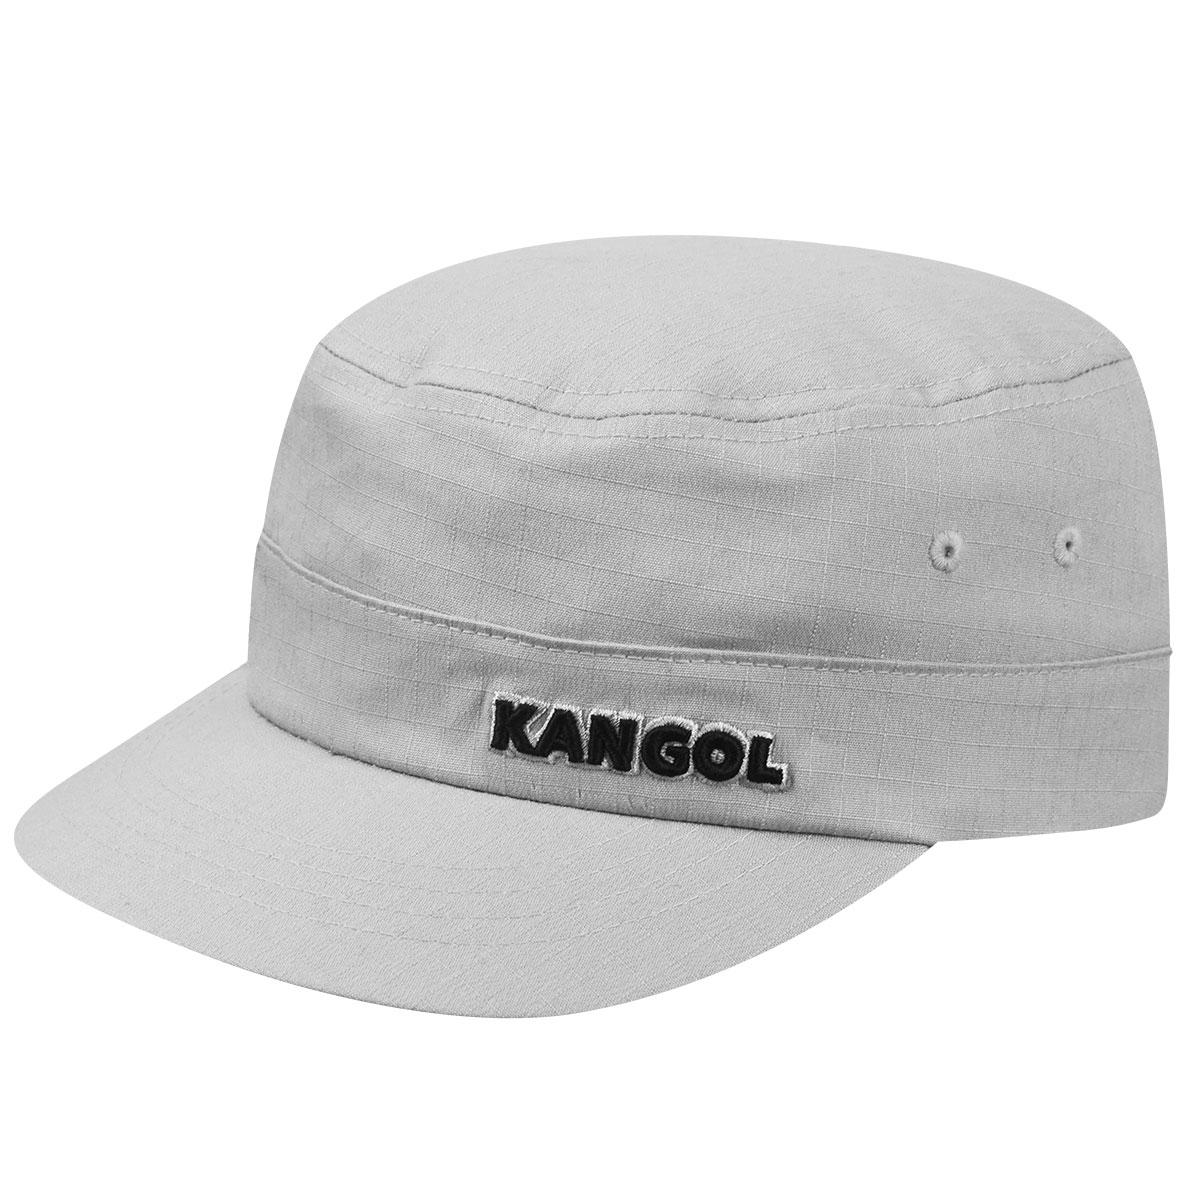 Kangol Ripstop Army Cap in Grey